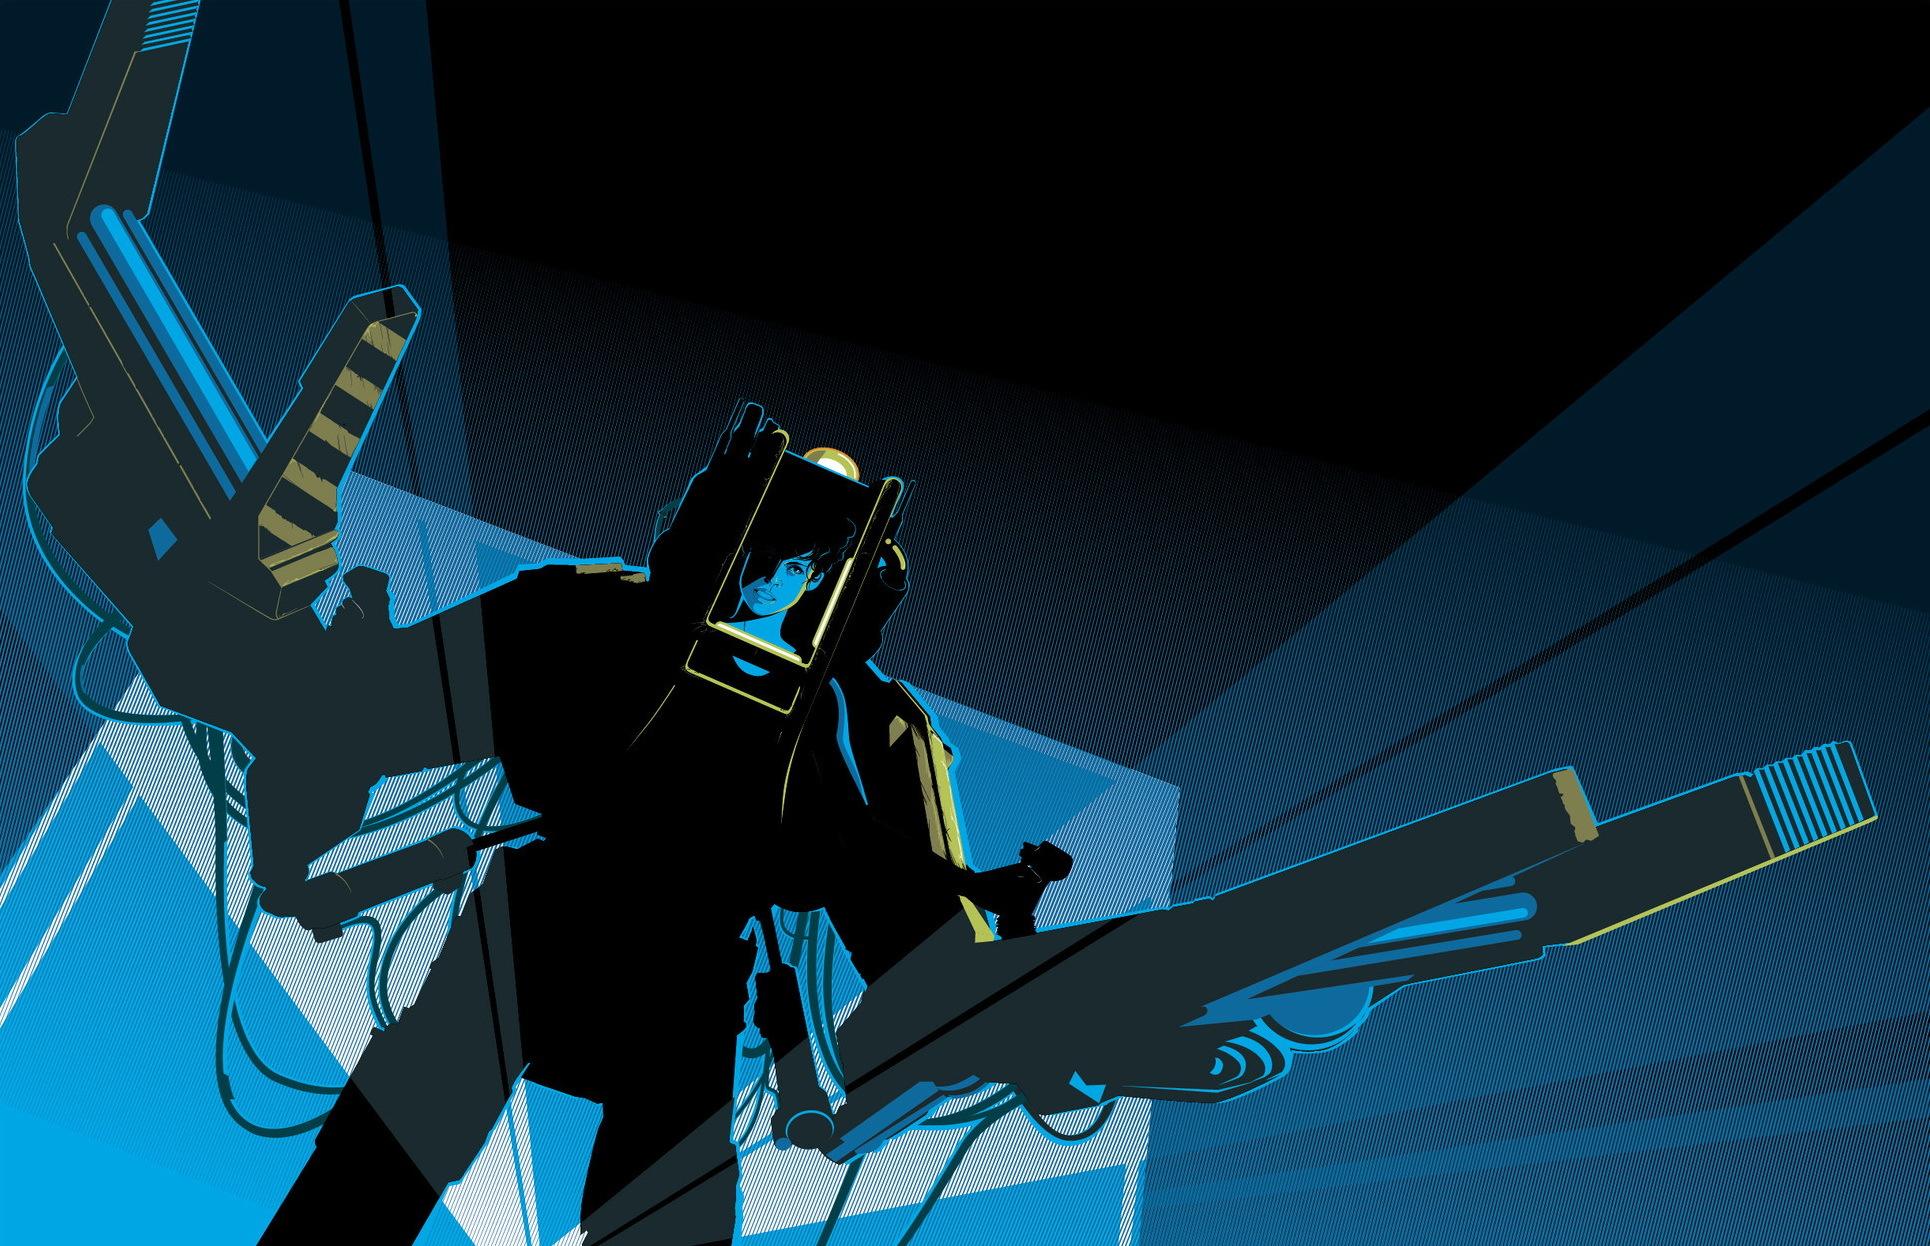 Wallpaper Illustration Anime Cartoon Aliens Craig Drake Art